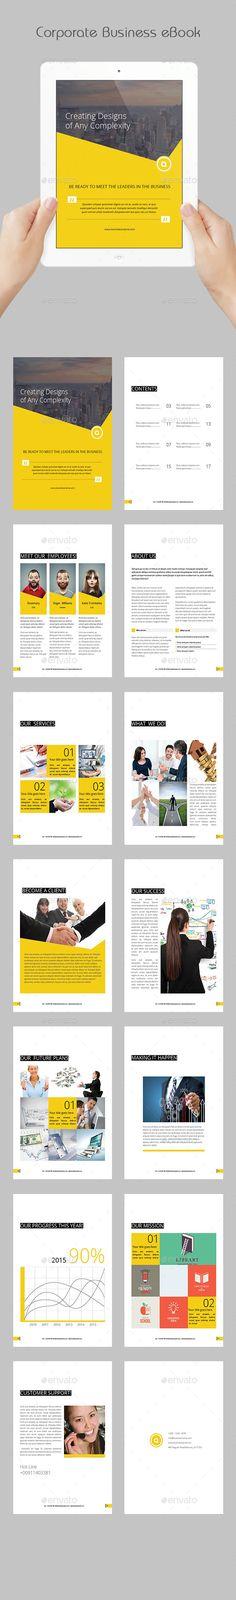 Corporate Business eBook Template #design #epublishing Download: http://graphicriver.net/item/corporate-business-ebook/11972523?ref=ksioks